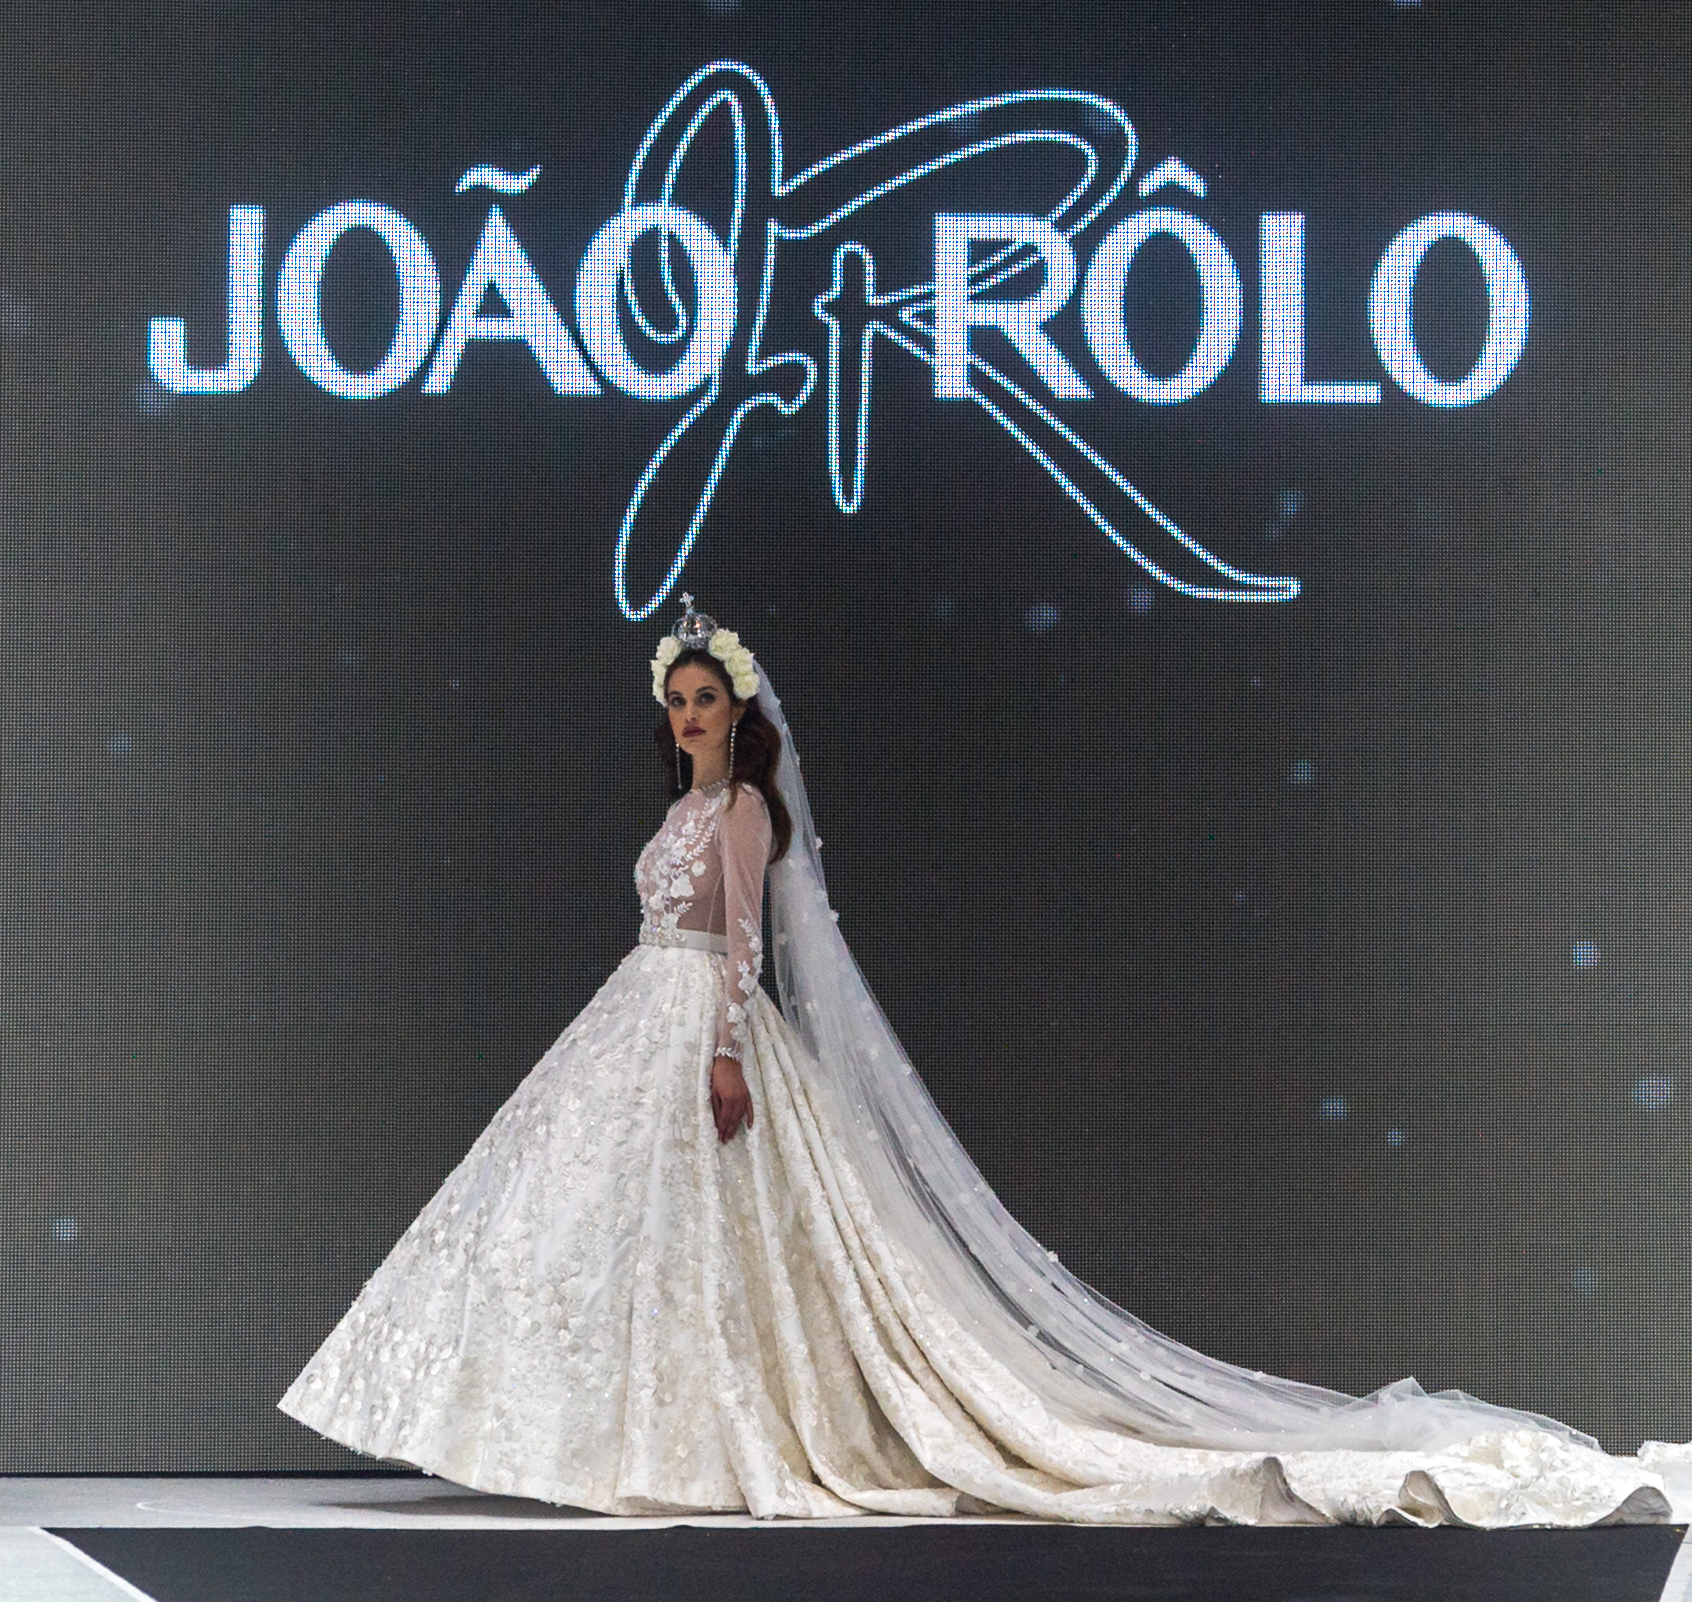 Joao Rolo presenta 'Jazz Divas' en Tenerife